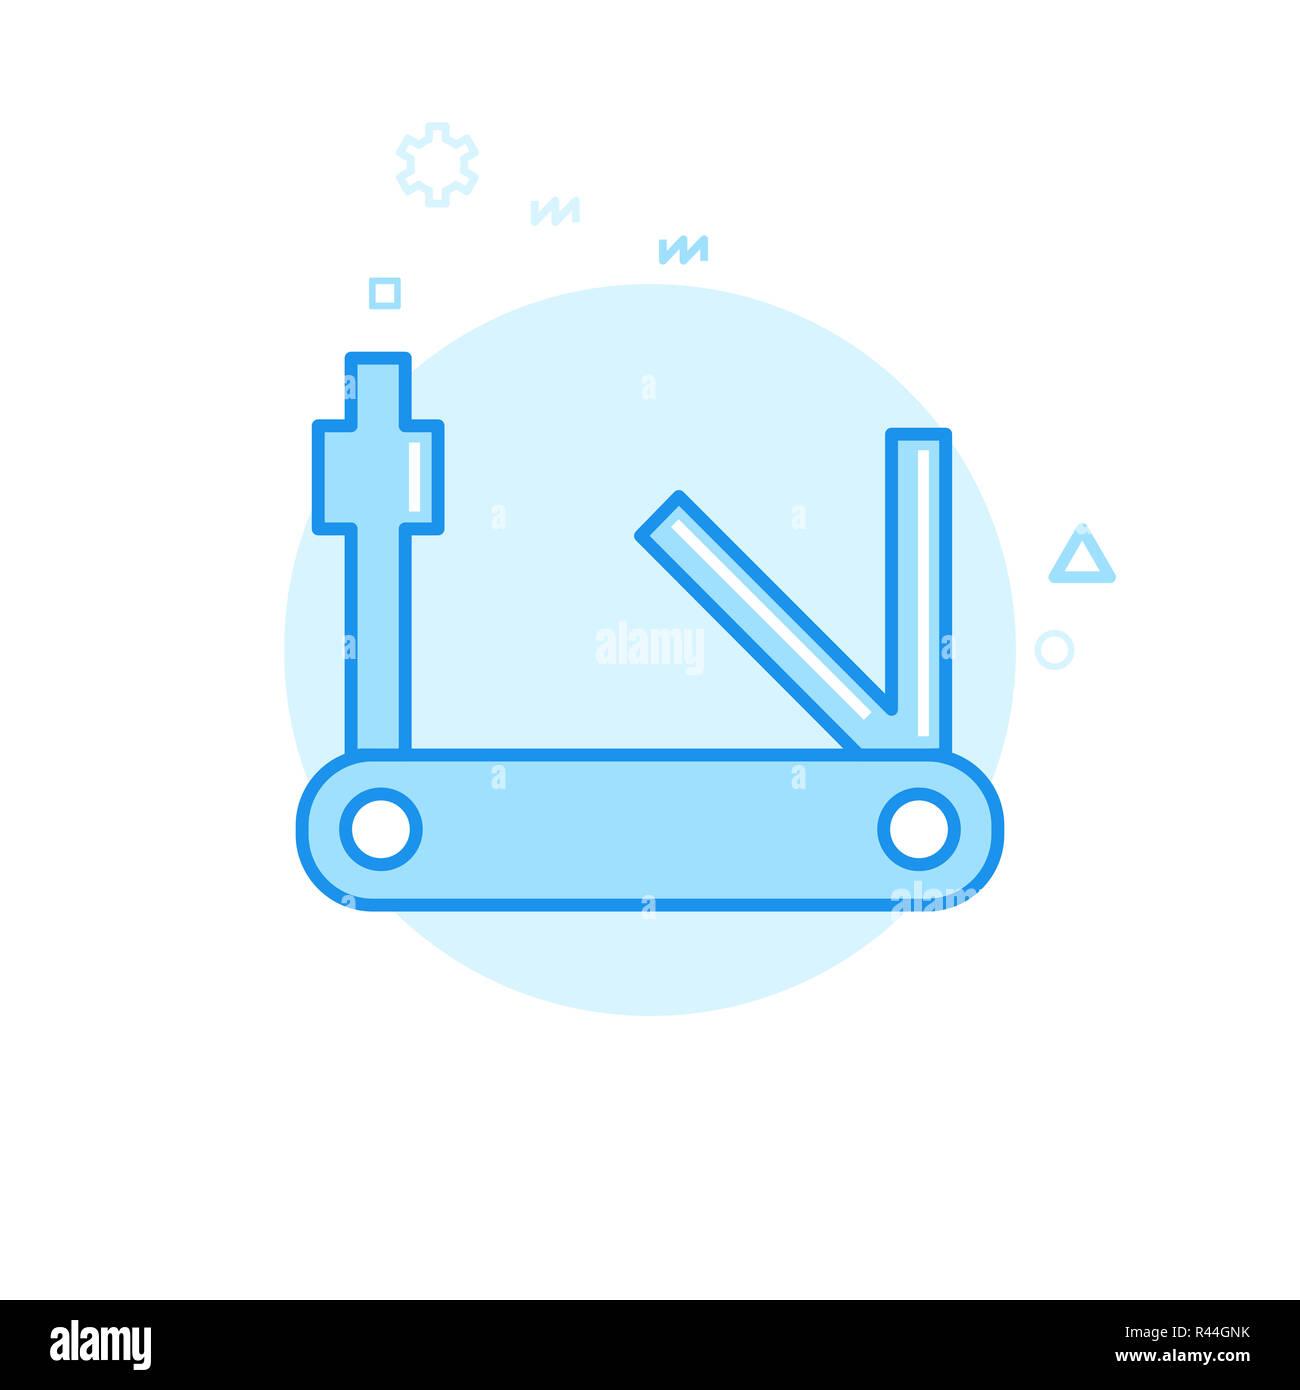 Bike Tools, Multitool Flat Icon. Bicycle Accessory Symbol, Pictogram, Sign. Light Flat Style. Blue Monochrome Design. Editable Stroke. Adjust Line Wei - Stock Image